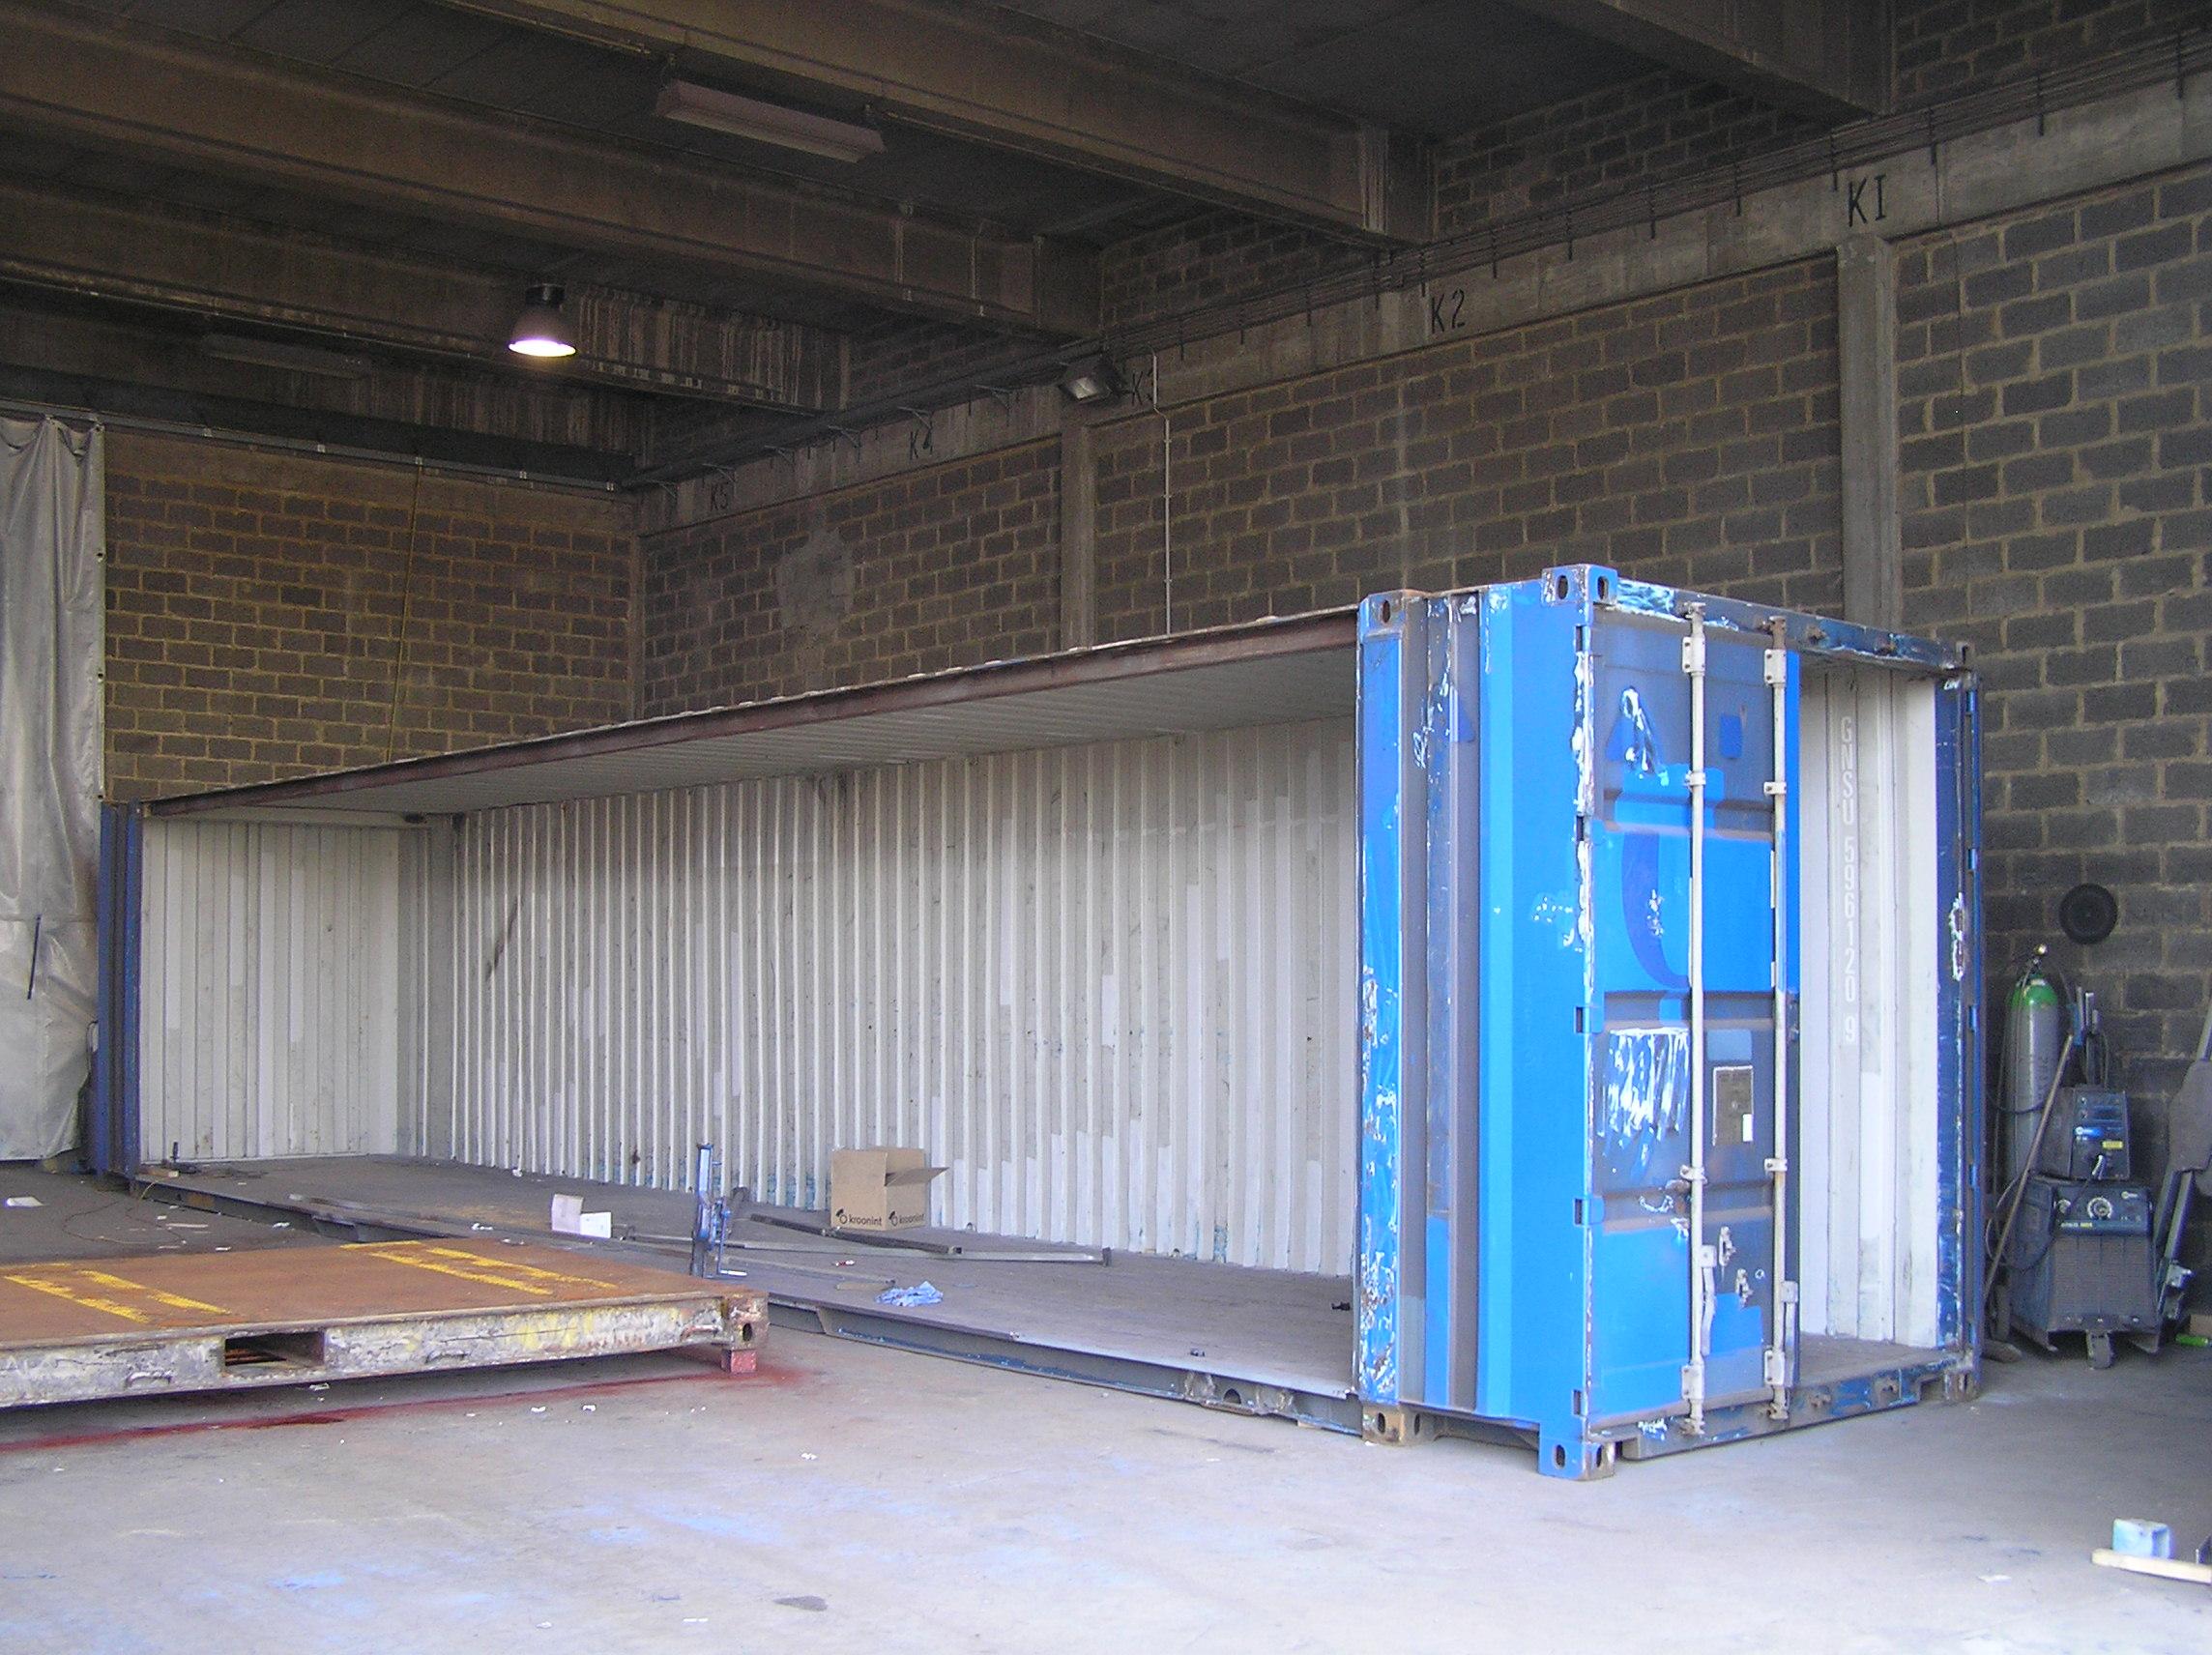 Achat conteneur dernier voyage containerderniervoyage - Acheter maison container ...